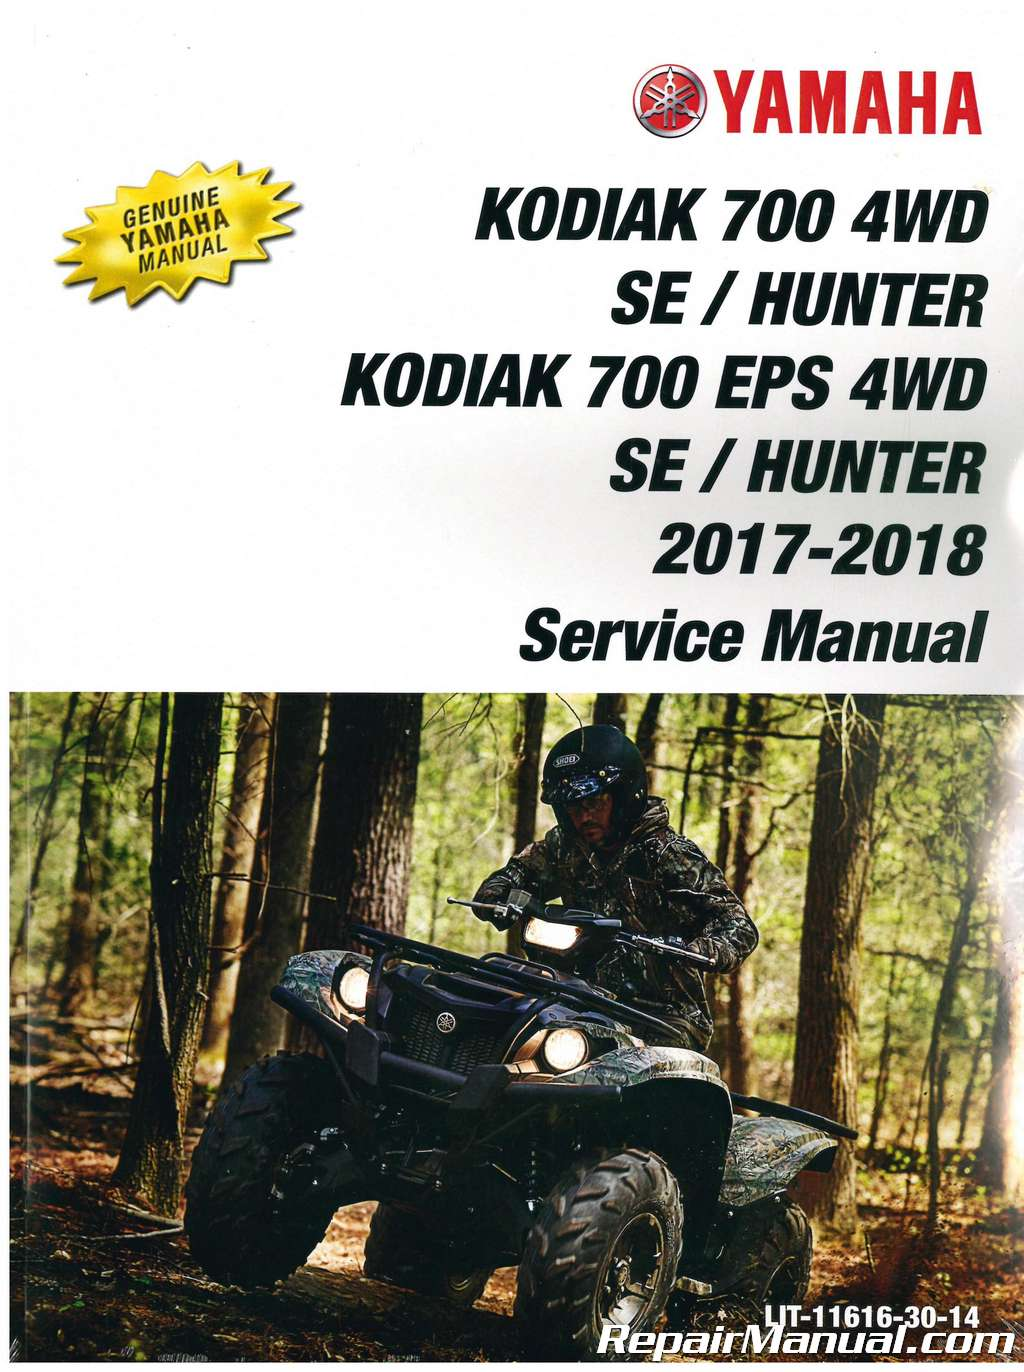 2017 – 2018 Yamaha Kodiak 700 ATV Service Manual